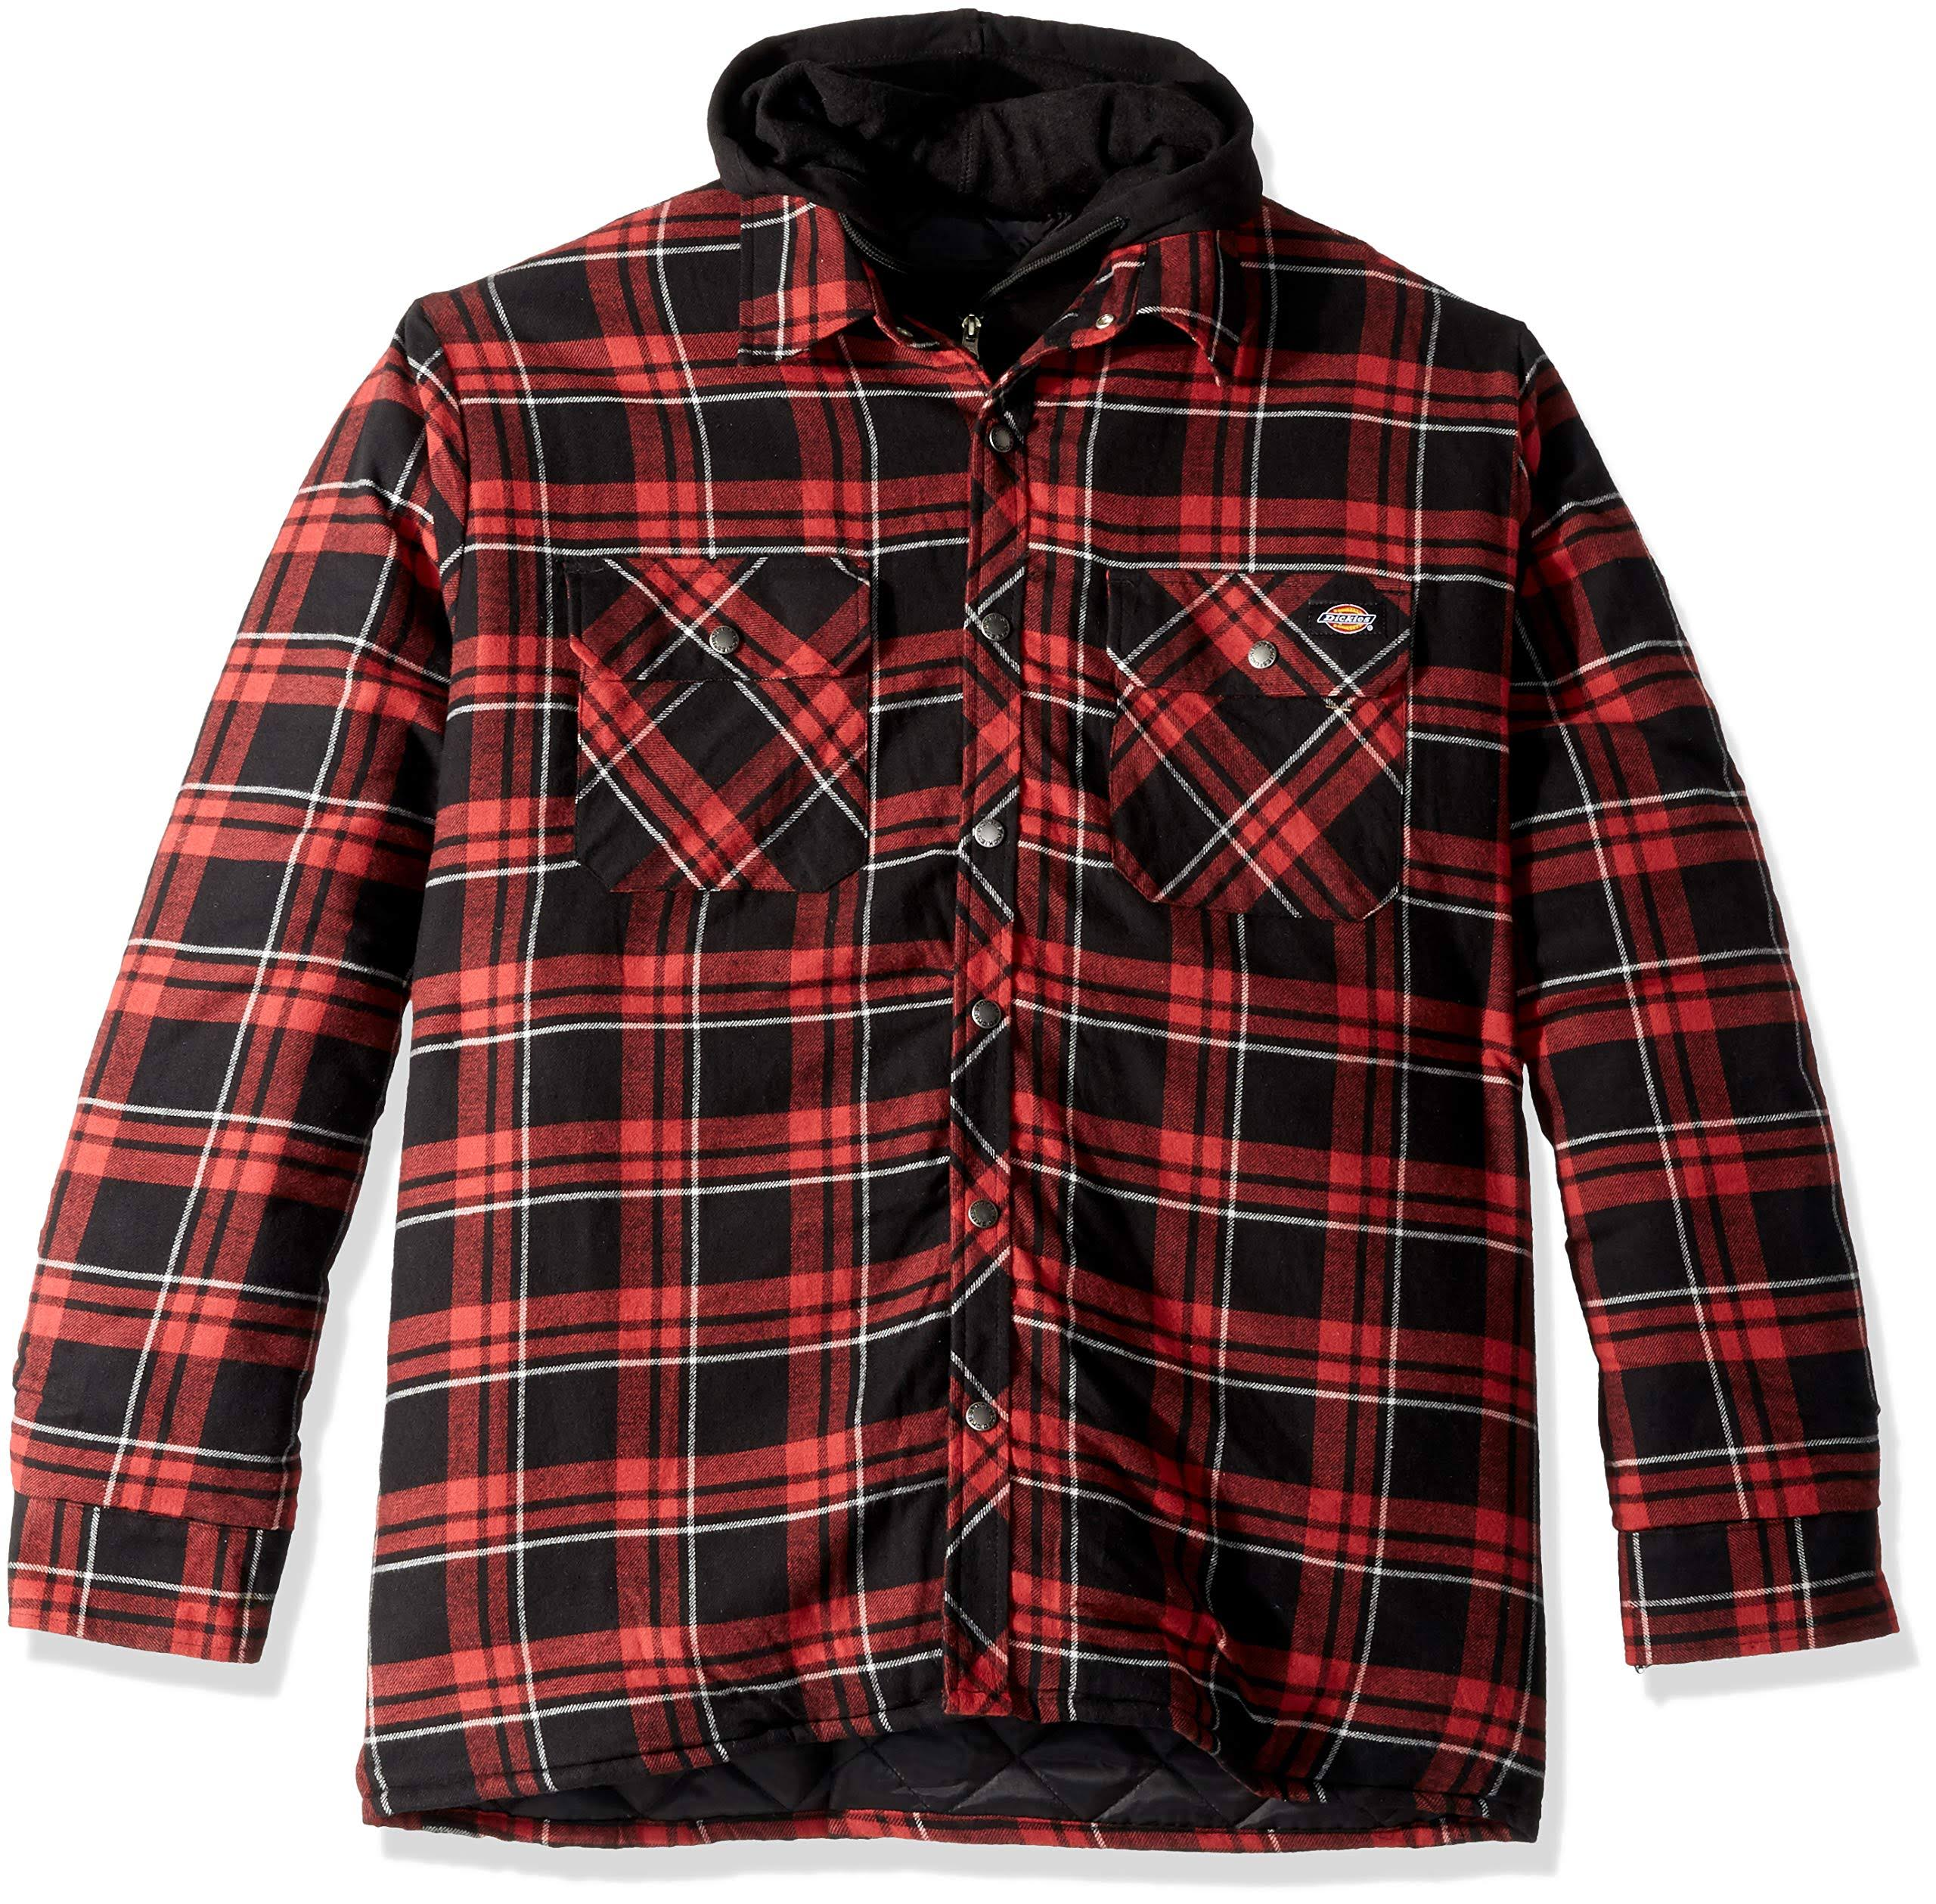 Para Capucha Y Plad Acolchada Holgada Hombre Con Gris Rojo Dickies Cane Chaqueta Camisa De I10qRww